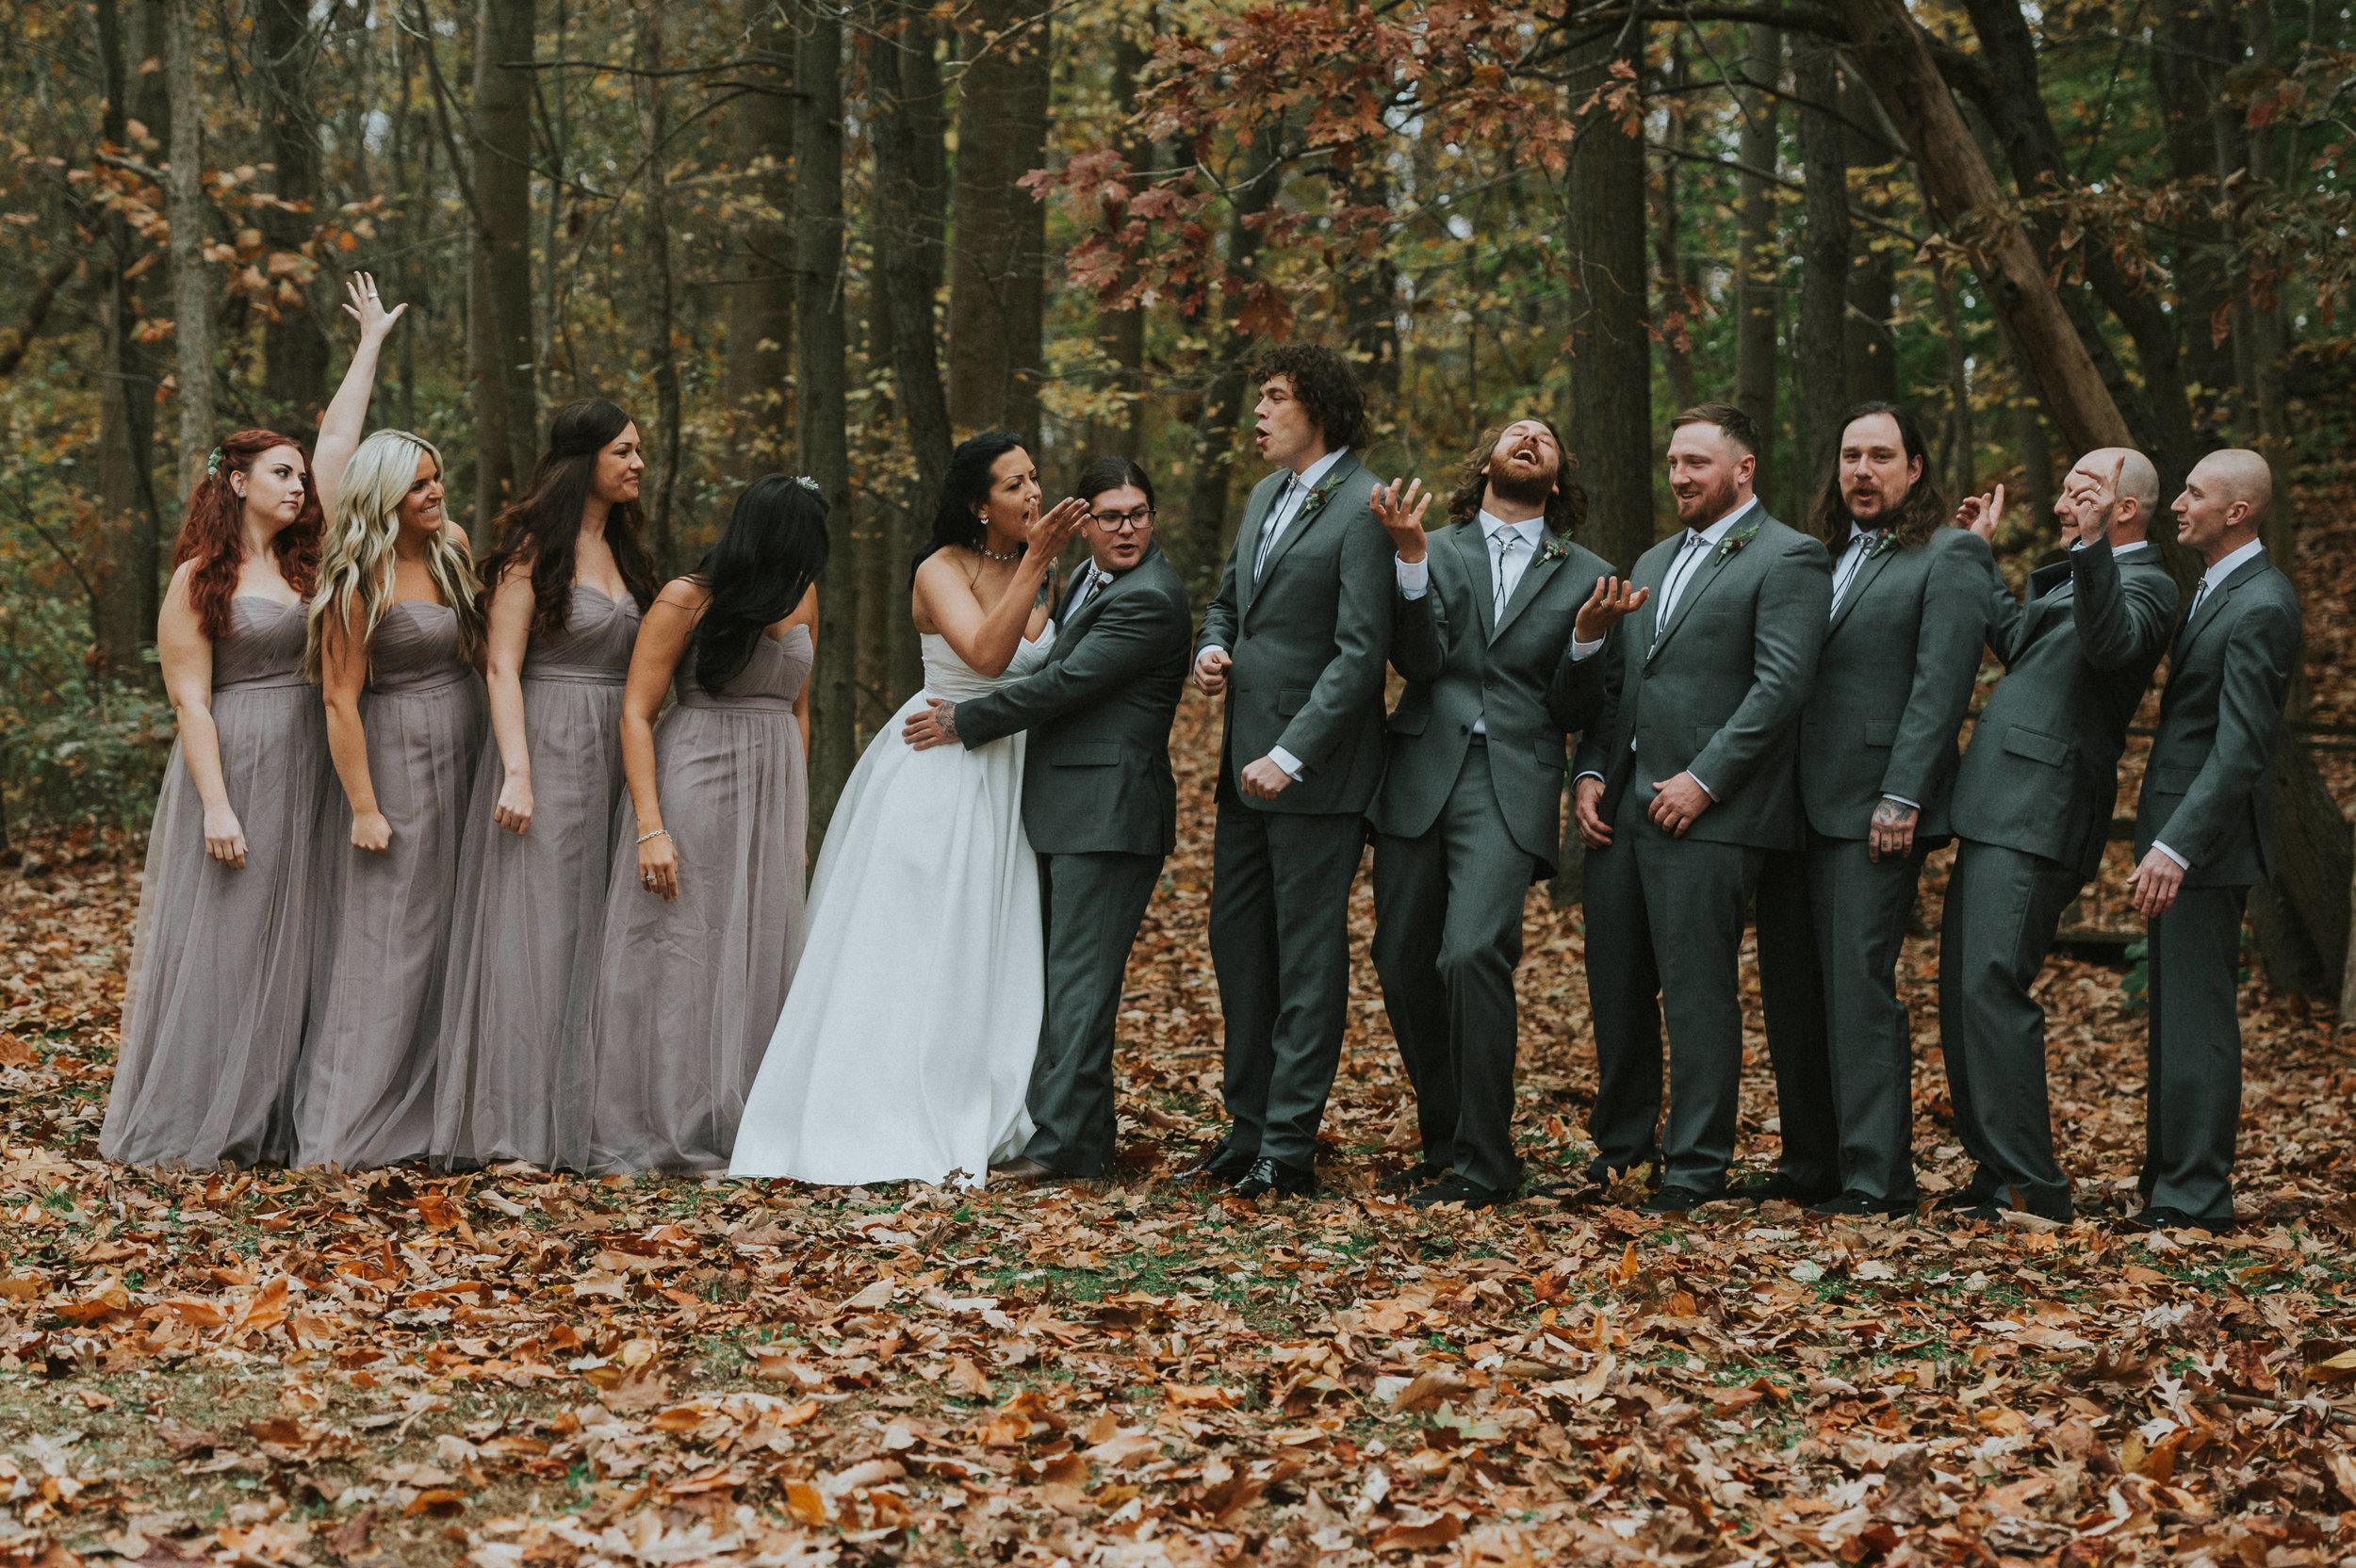 Rodes-Barn-Wedding-Mackenzie-and-Dylan-271.jpg